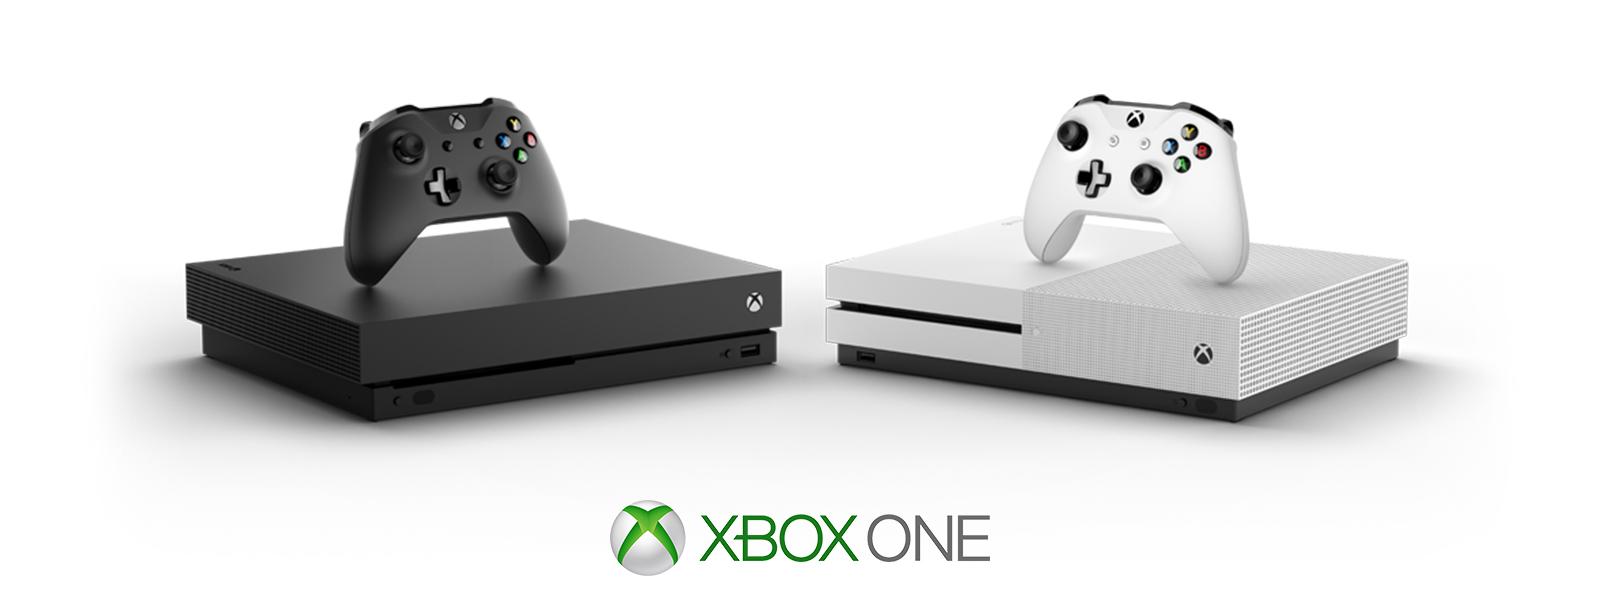 Xbox One X 與 Xbox One S